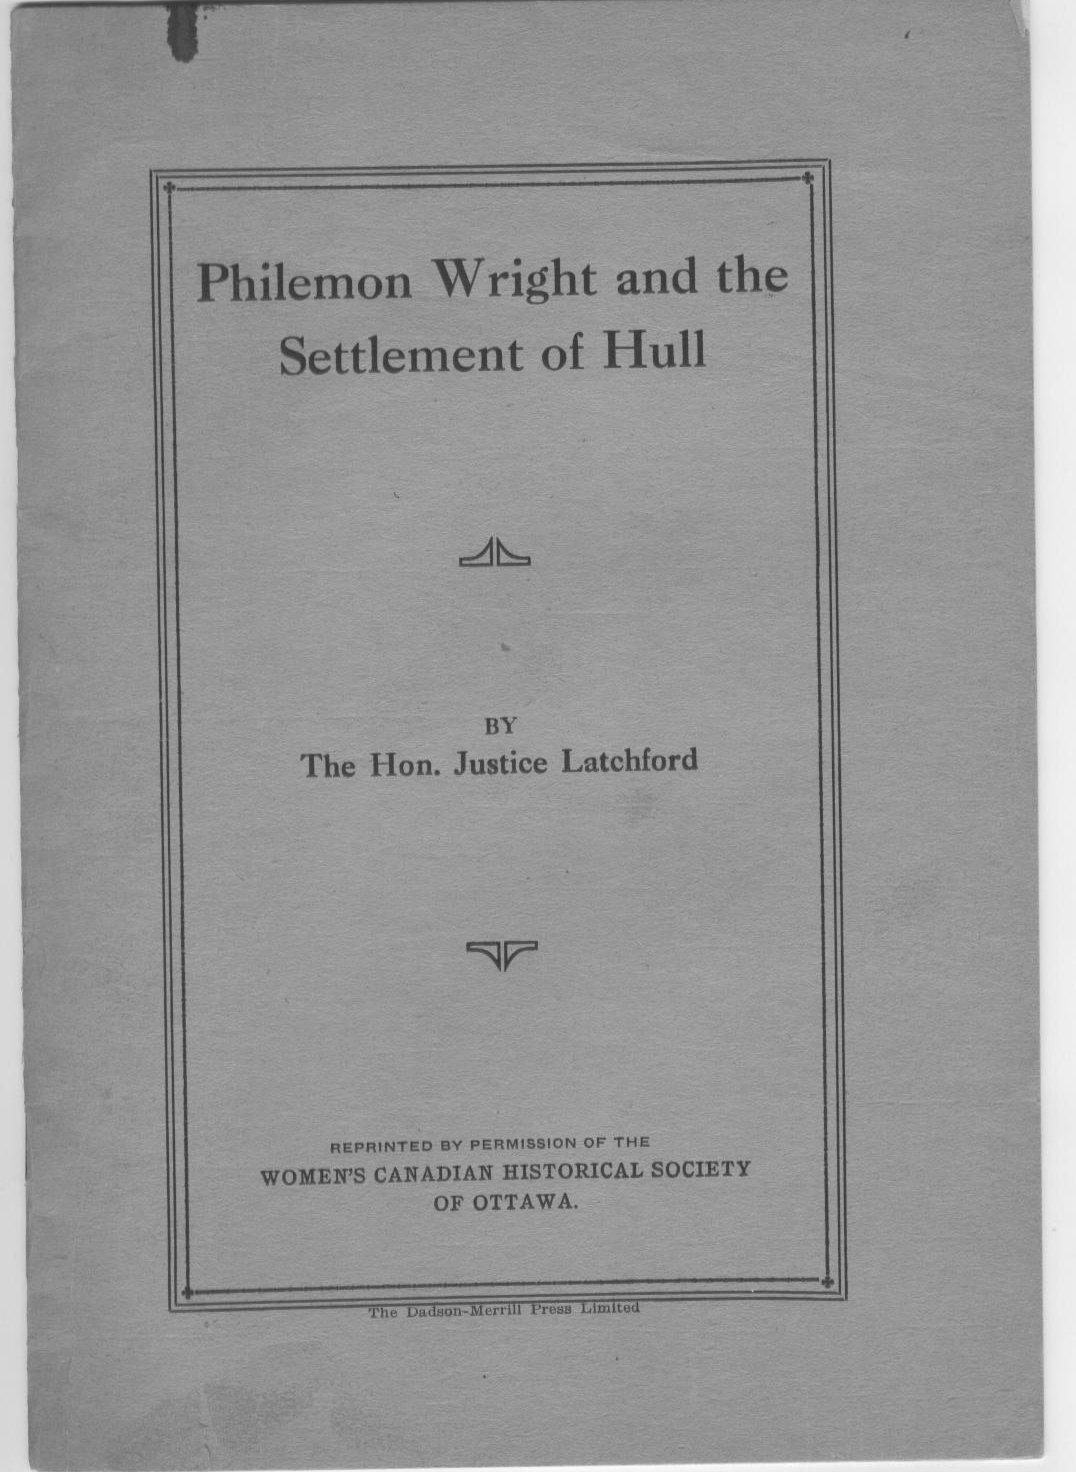 Speech, 1931, by Francis Latchford